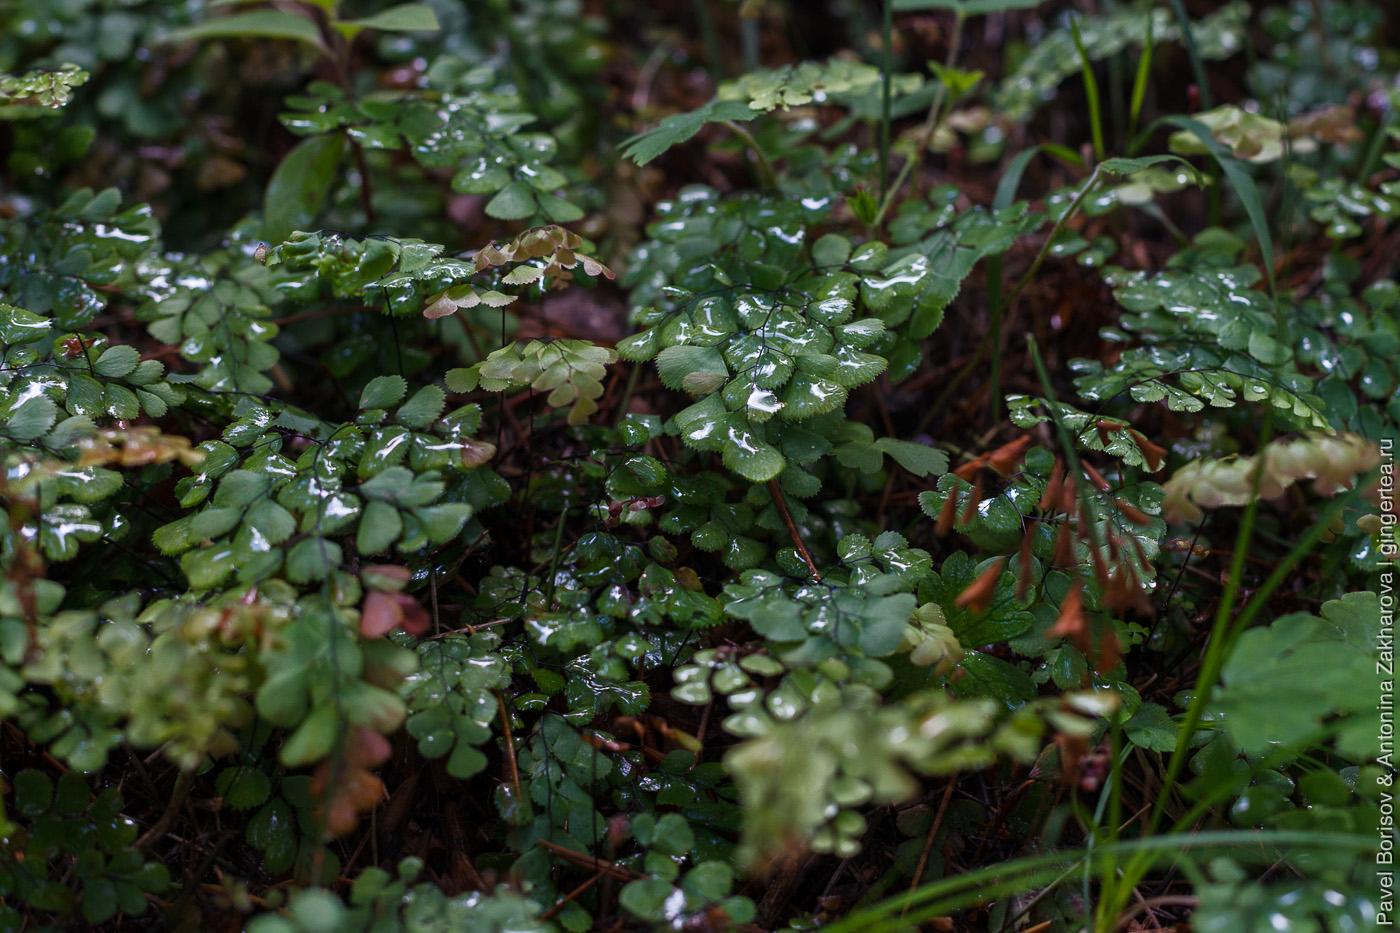 капли дождя на папоротнике